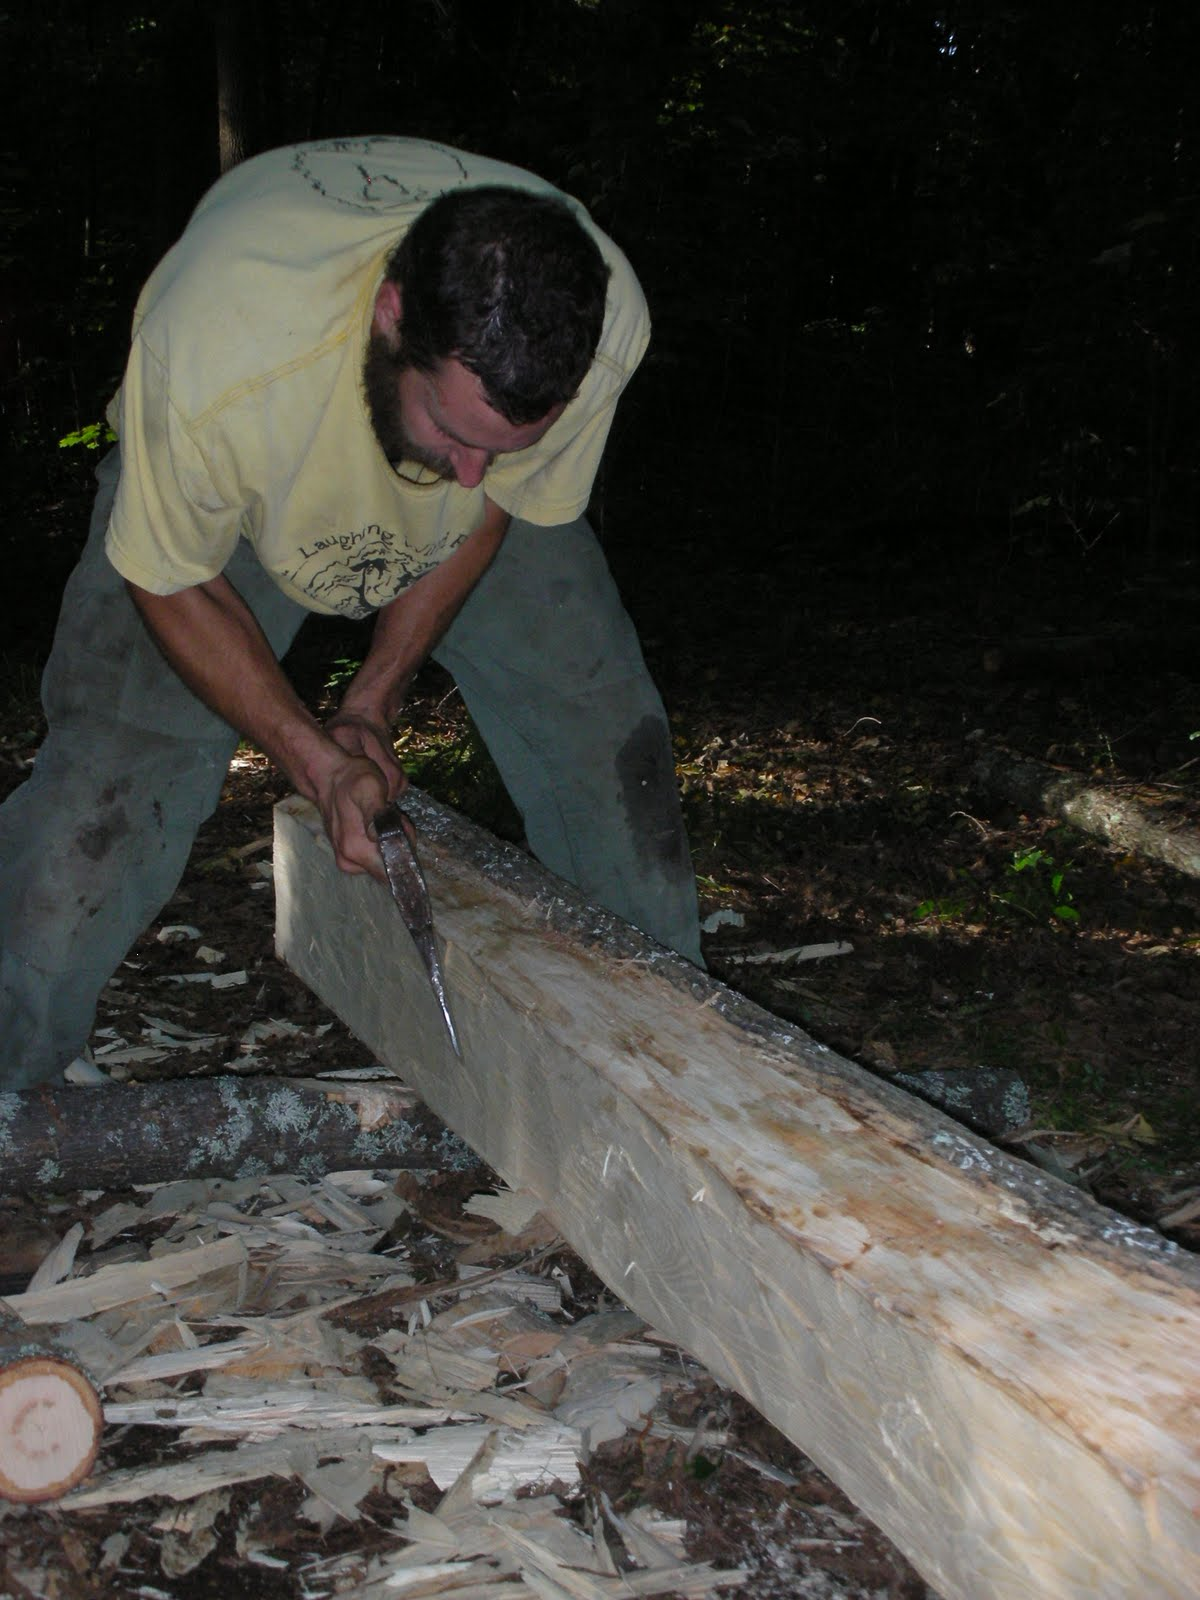 Michael Cuba puts the finishing touches on a log joist.